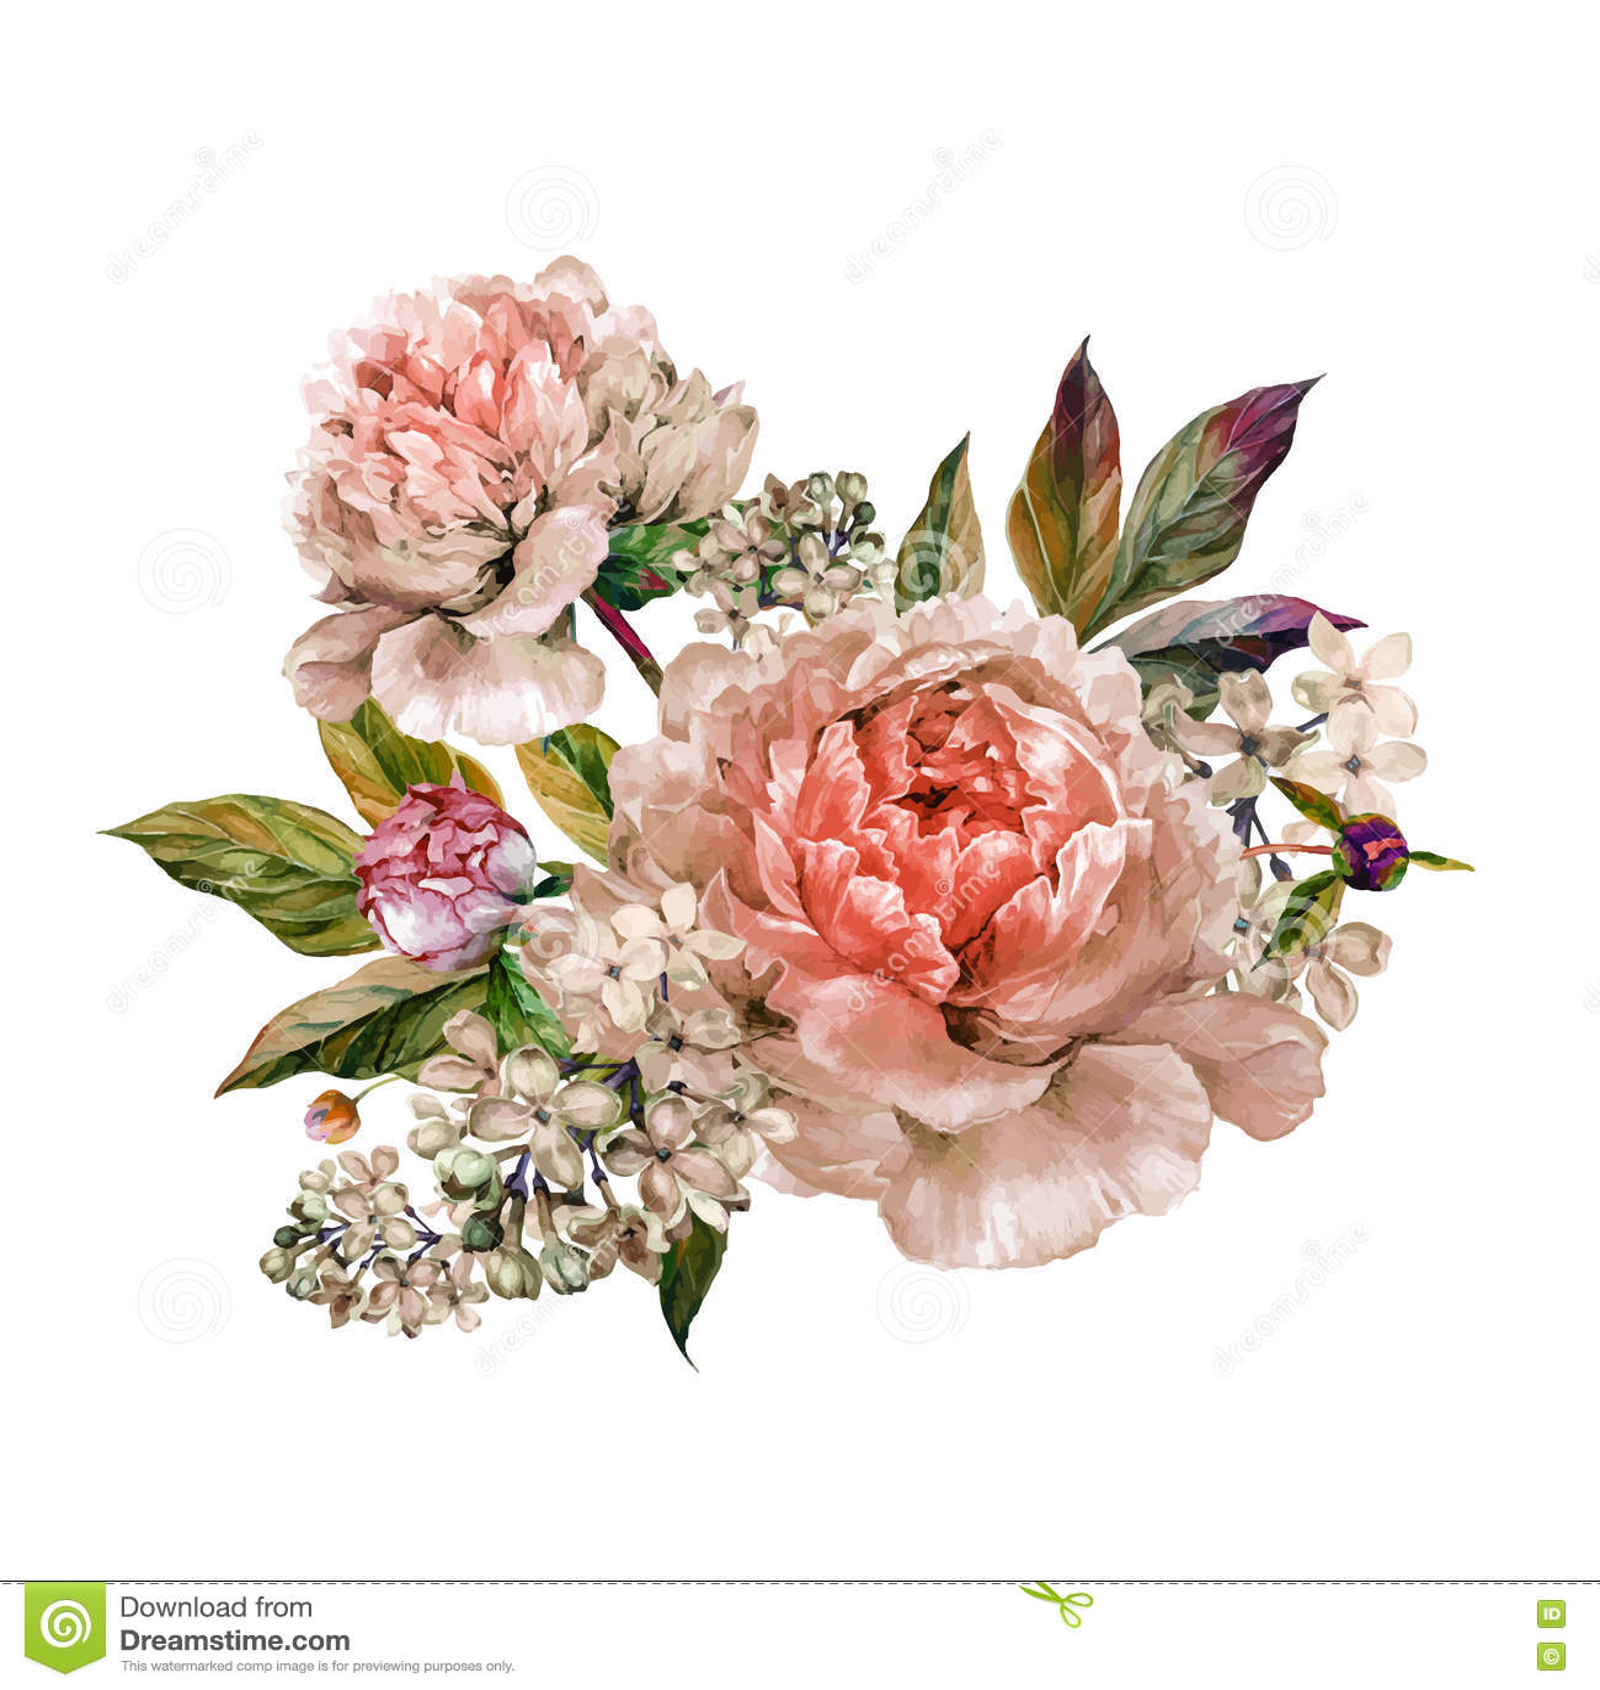 Vintage Floral Bouquet Peonies Stock Vector Image